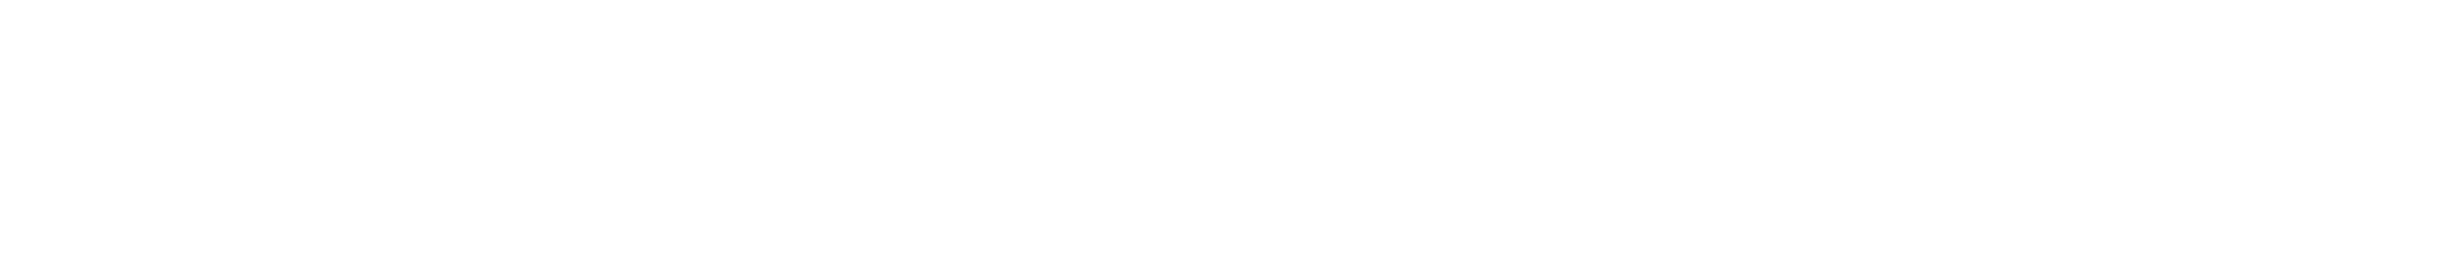 neag-school-of-education-wordmark-side-white